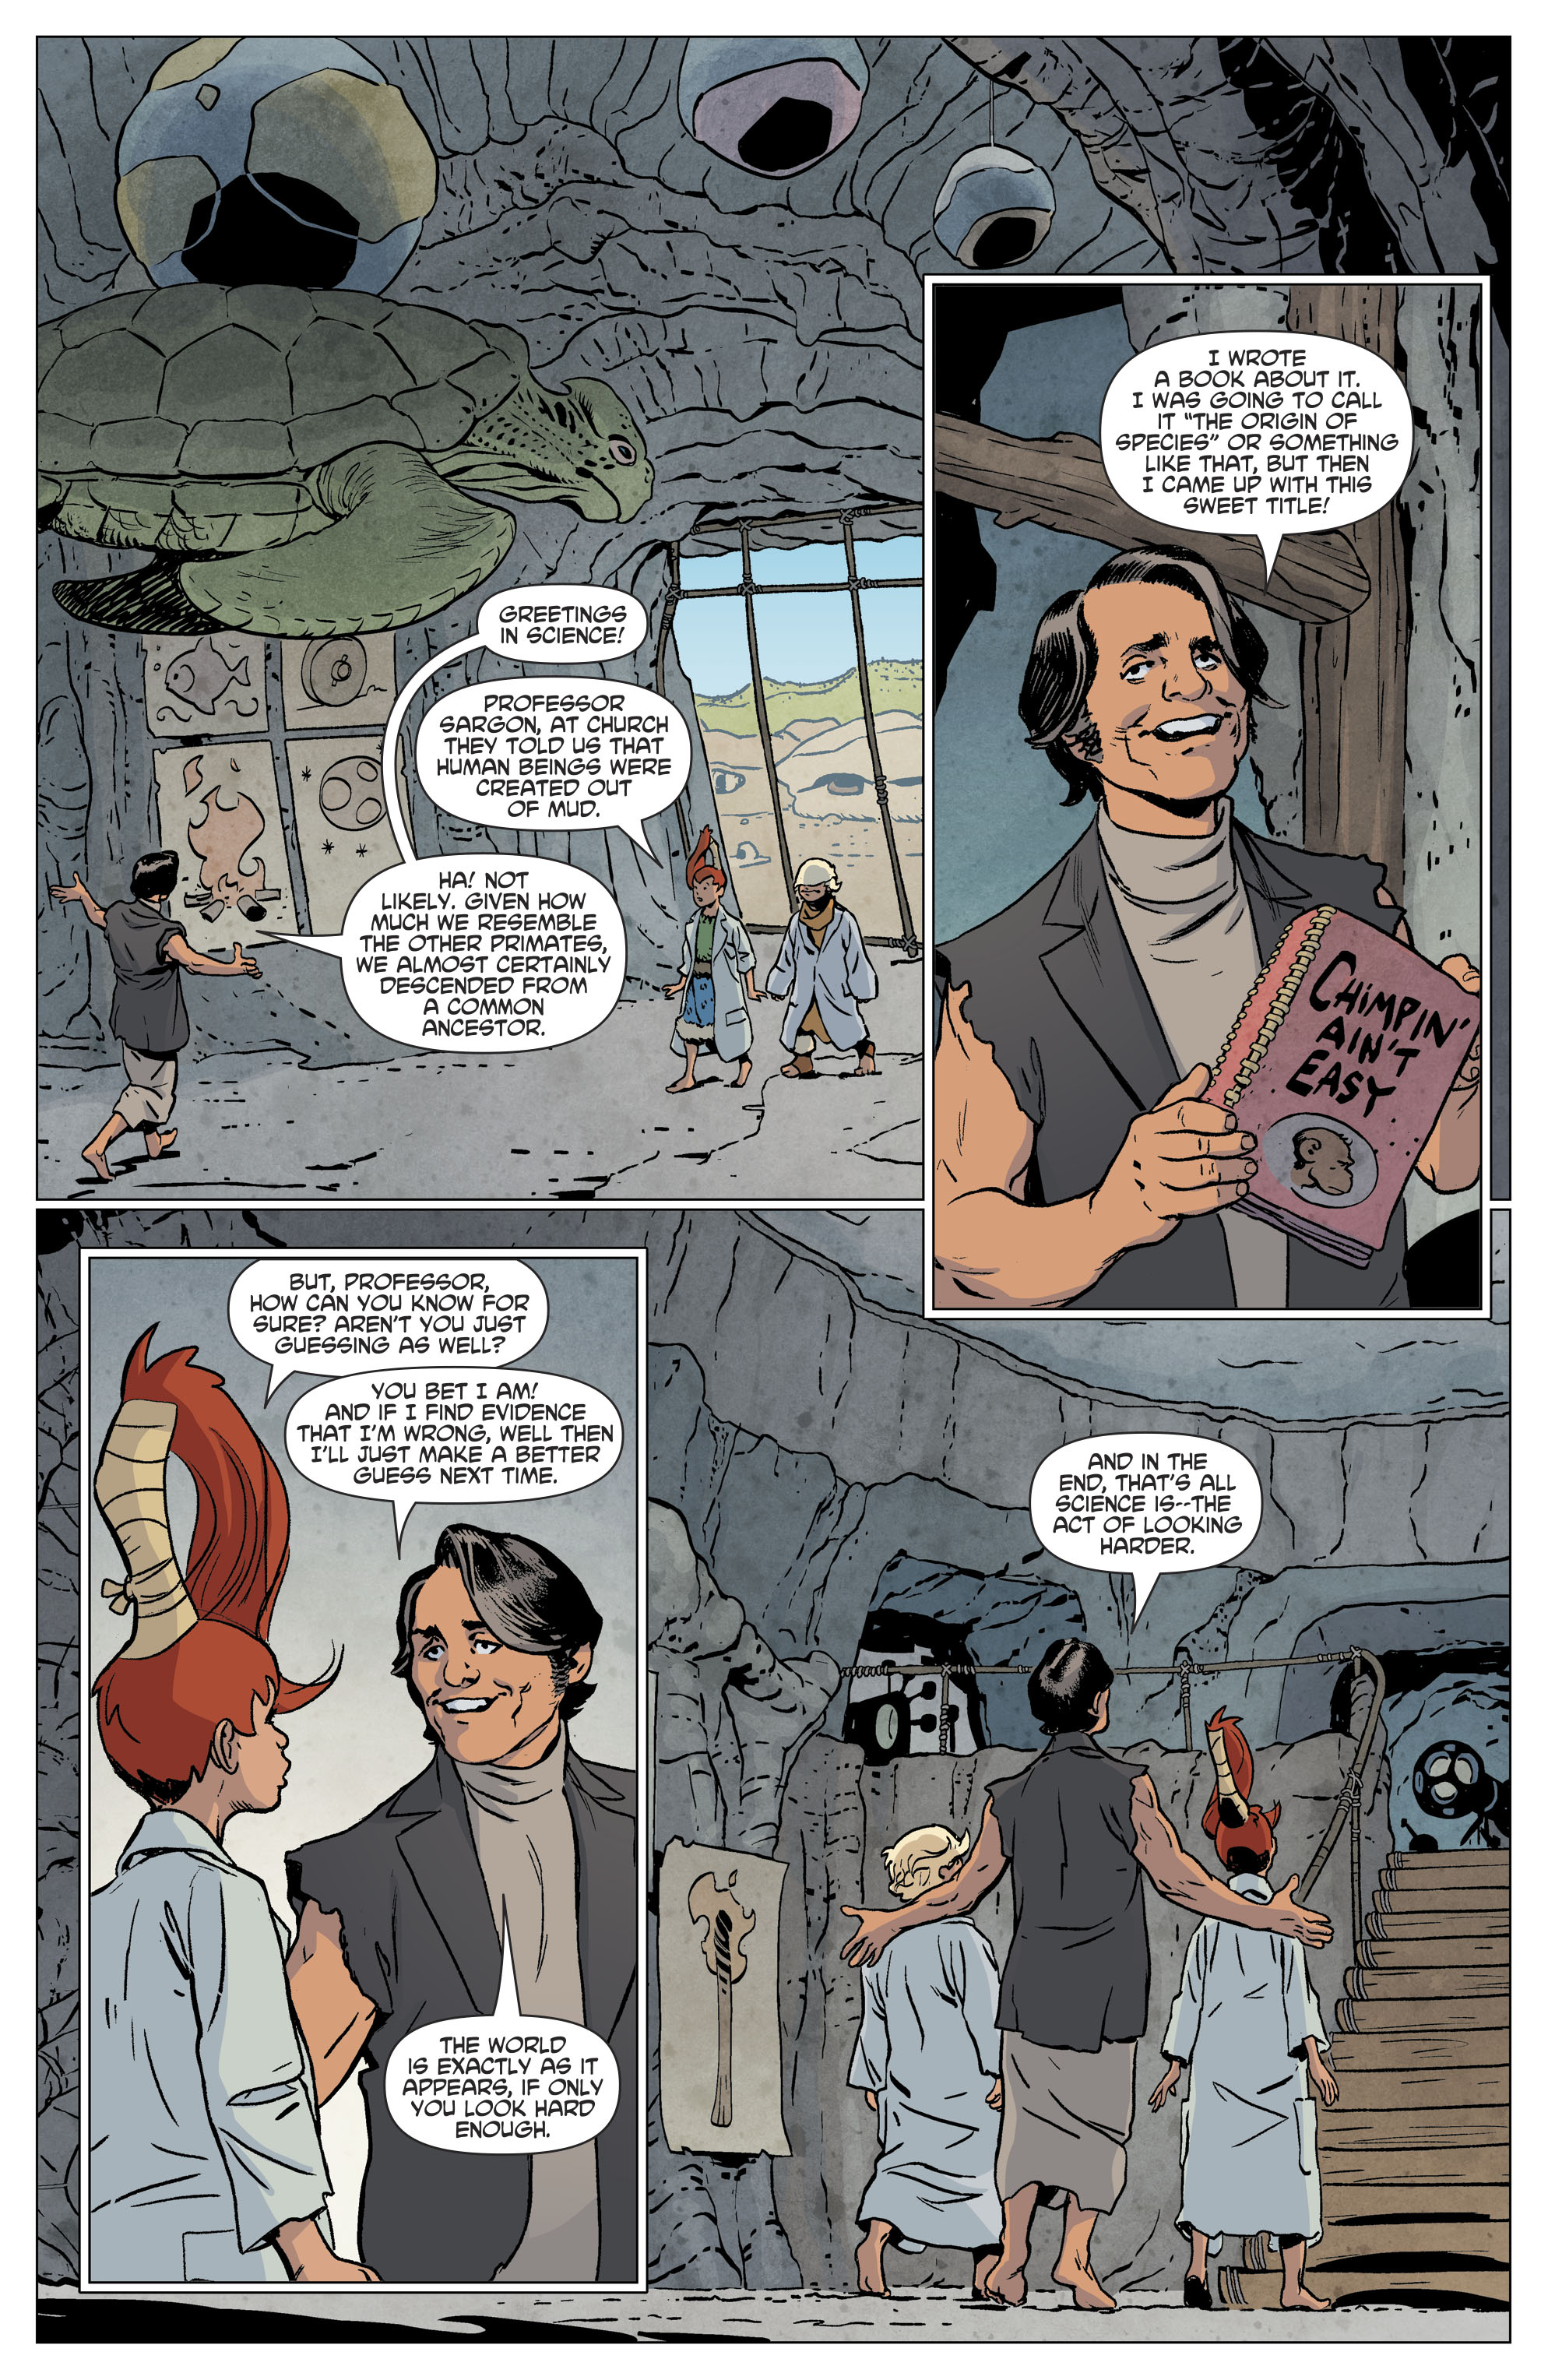 Read online The Flintstones comic -  Issue #12 - 12